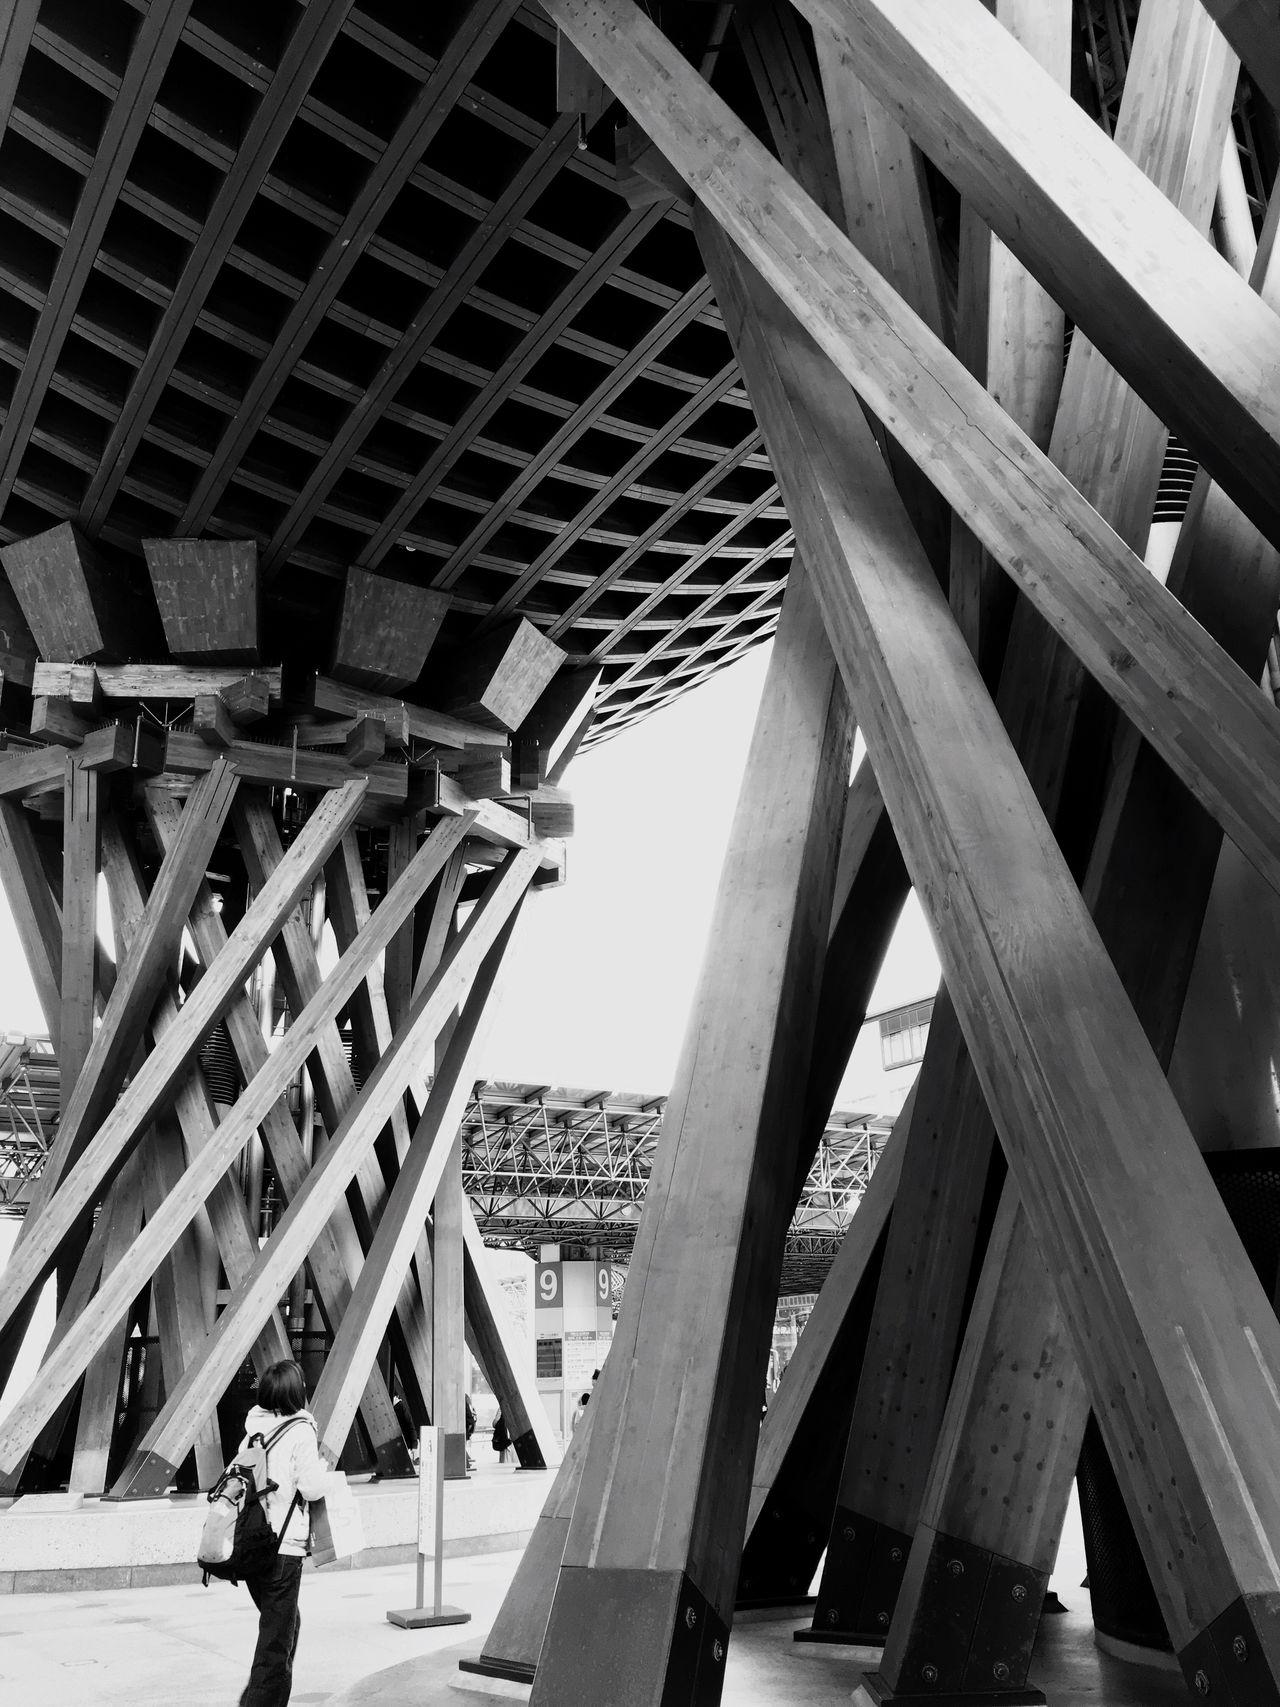 鼓門 @KANAZAWA Gate Station Archtecture Kanazawa,japan